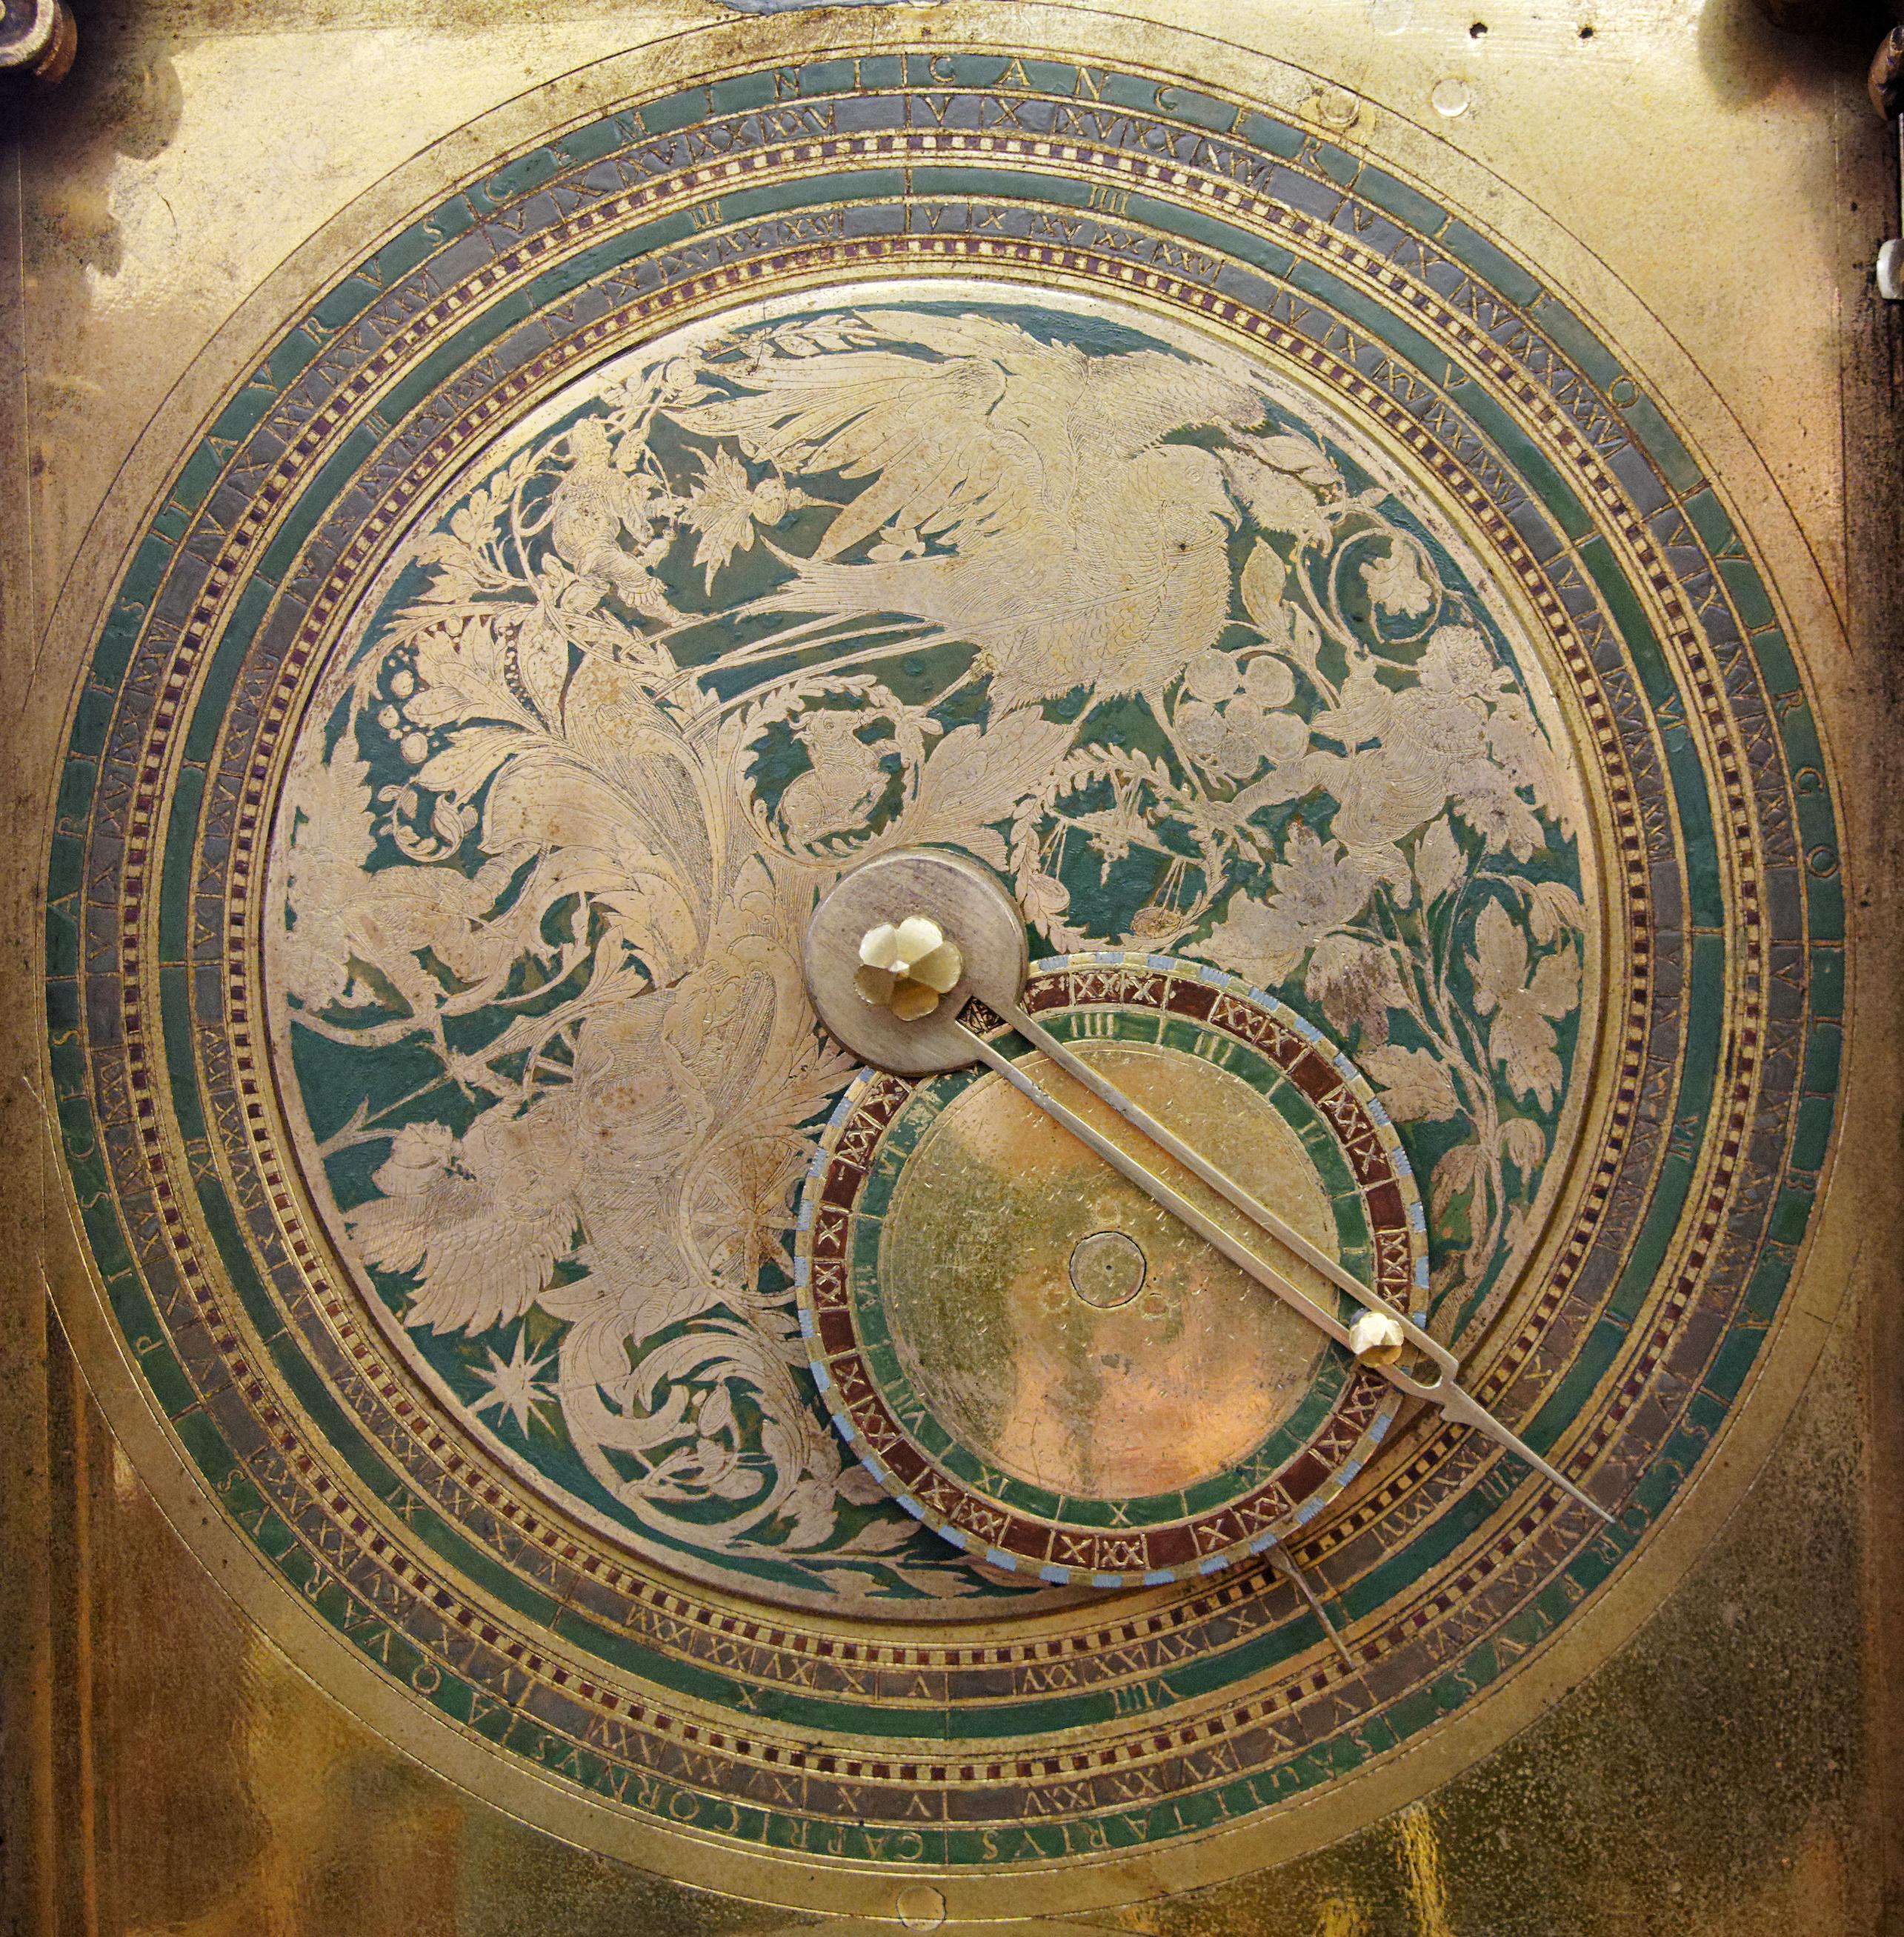 Horloge De Bureau Originale file:horloge astronomique bibliotheque sainte-genevieve n3